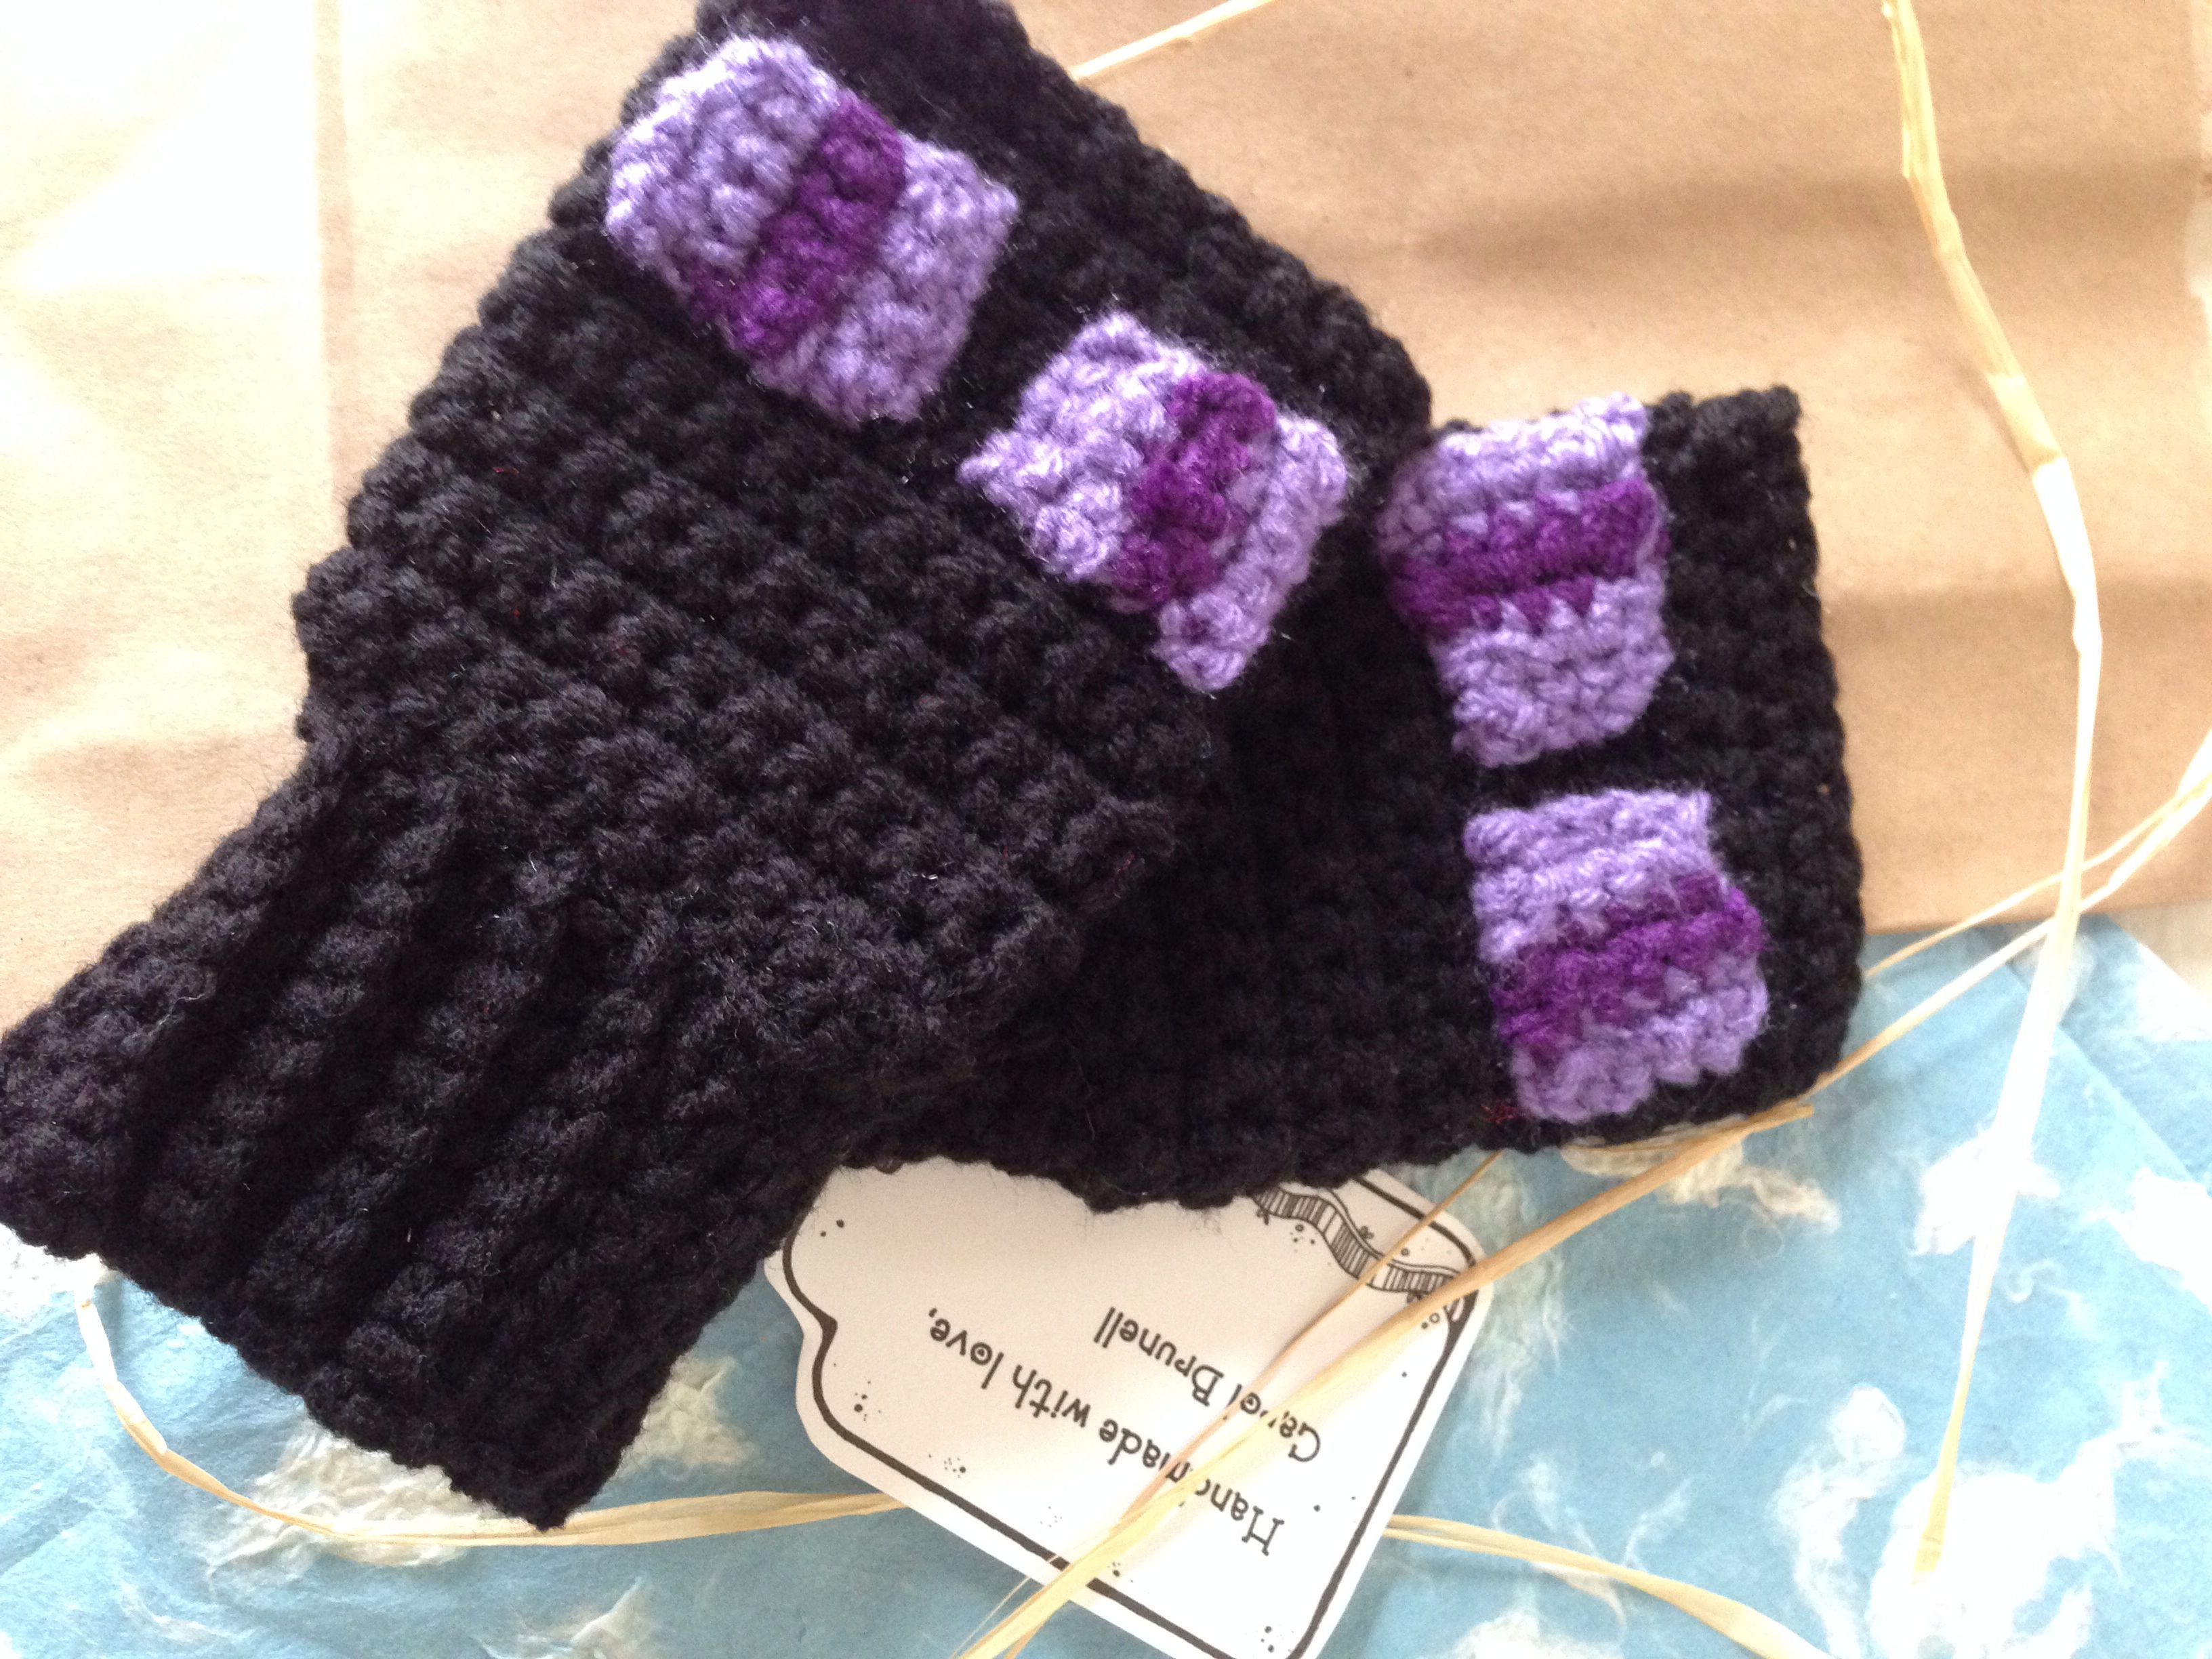 Mindcraft Fingerless Mittens yep every won wants to wear there worst ...